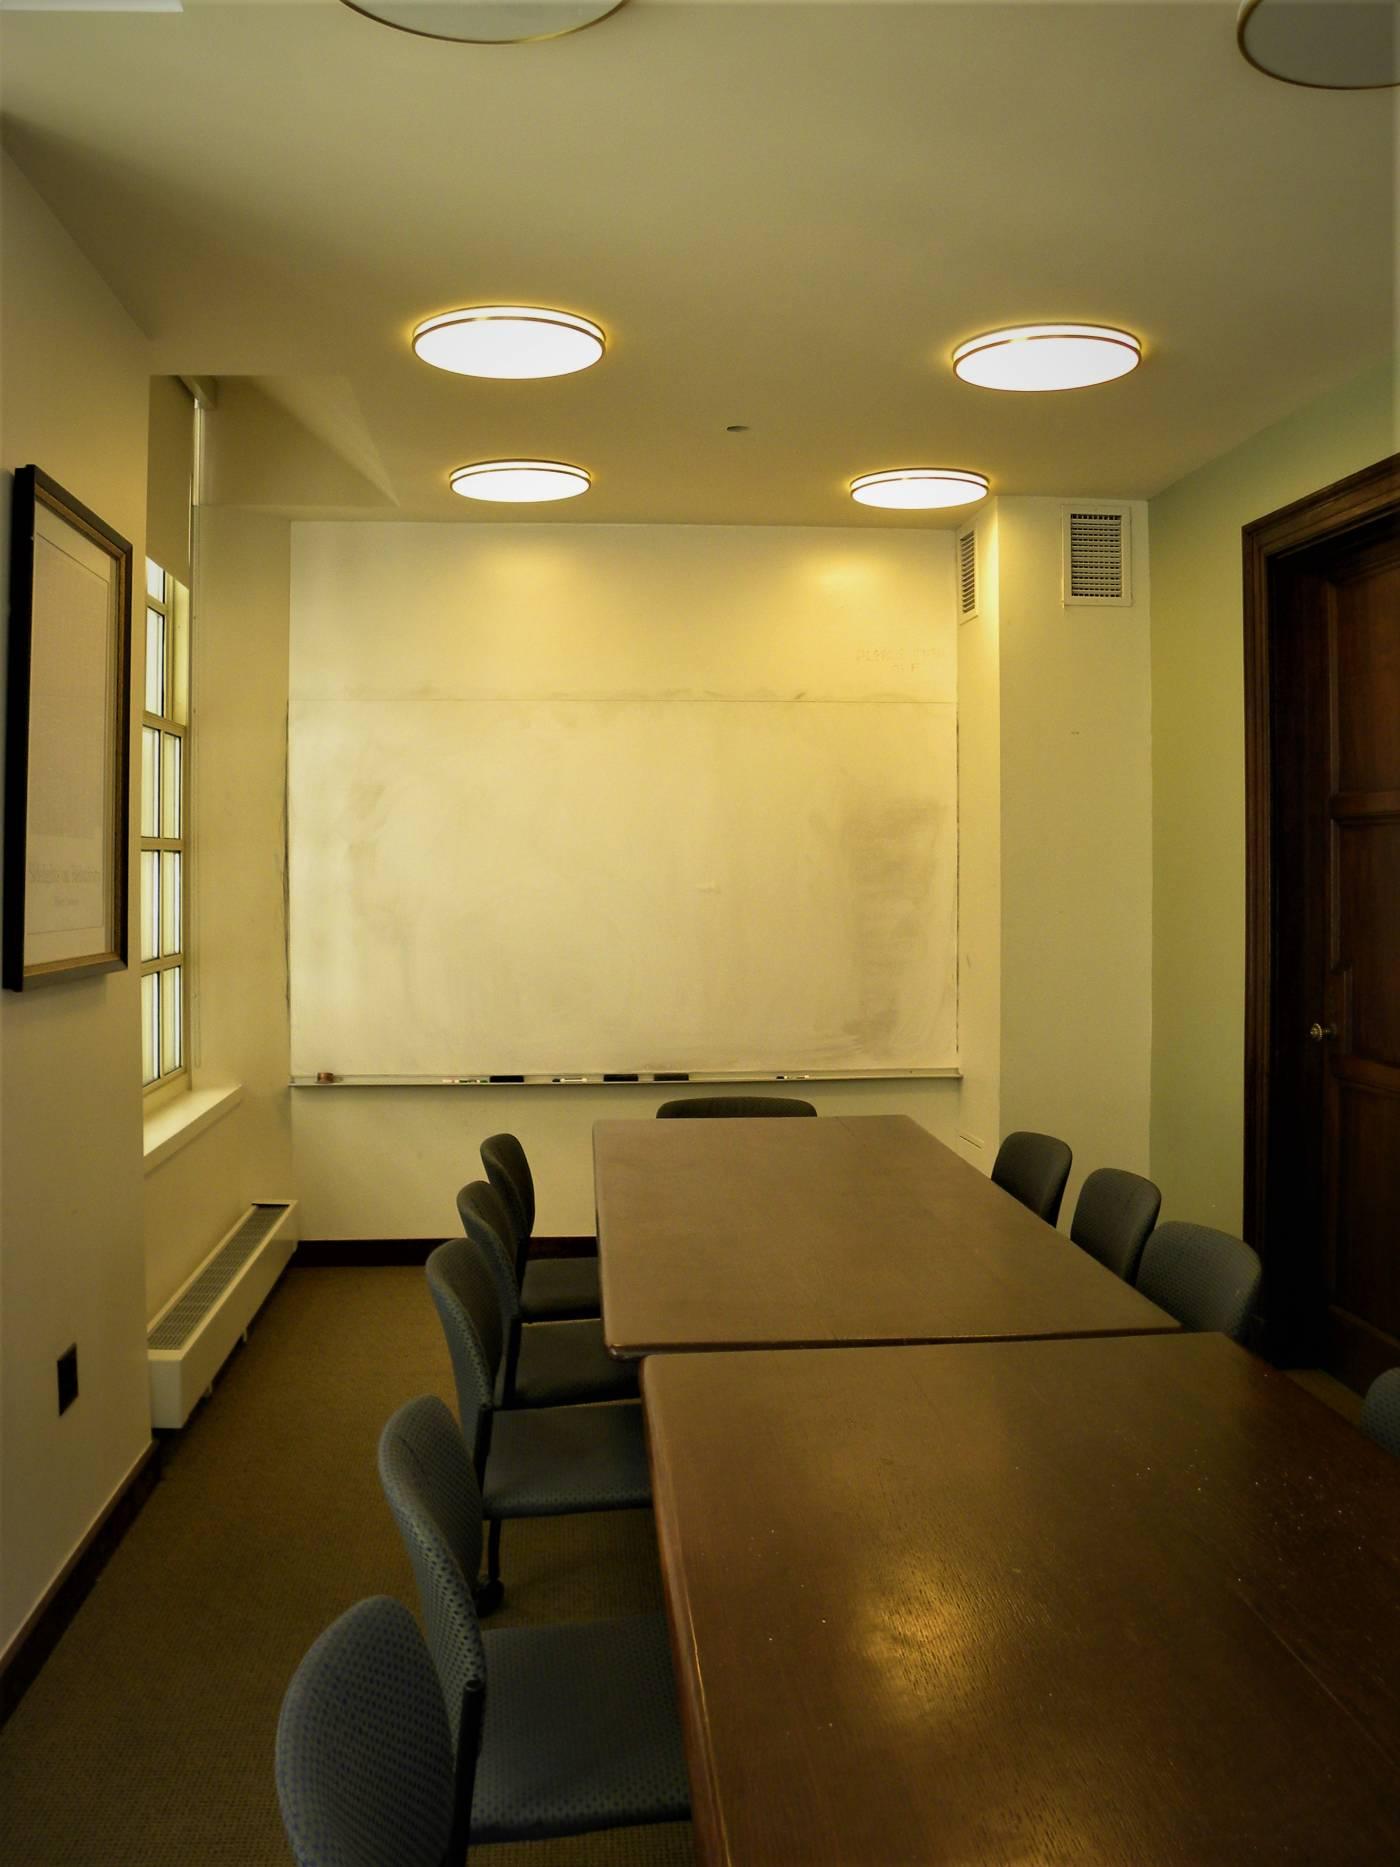 Welch Hall Second Floor, Room 202